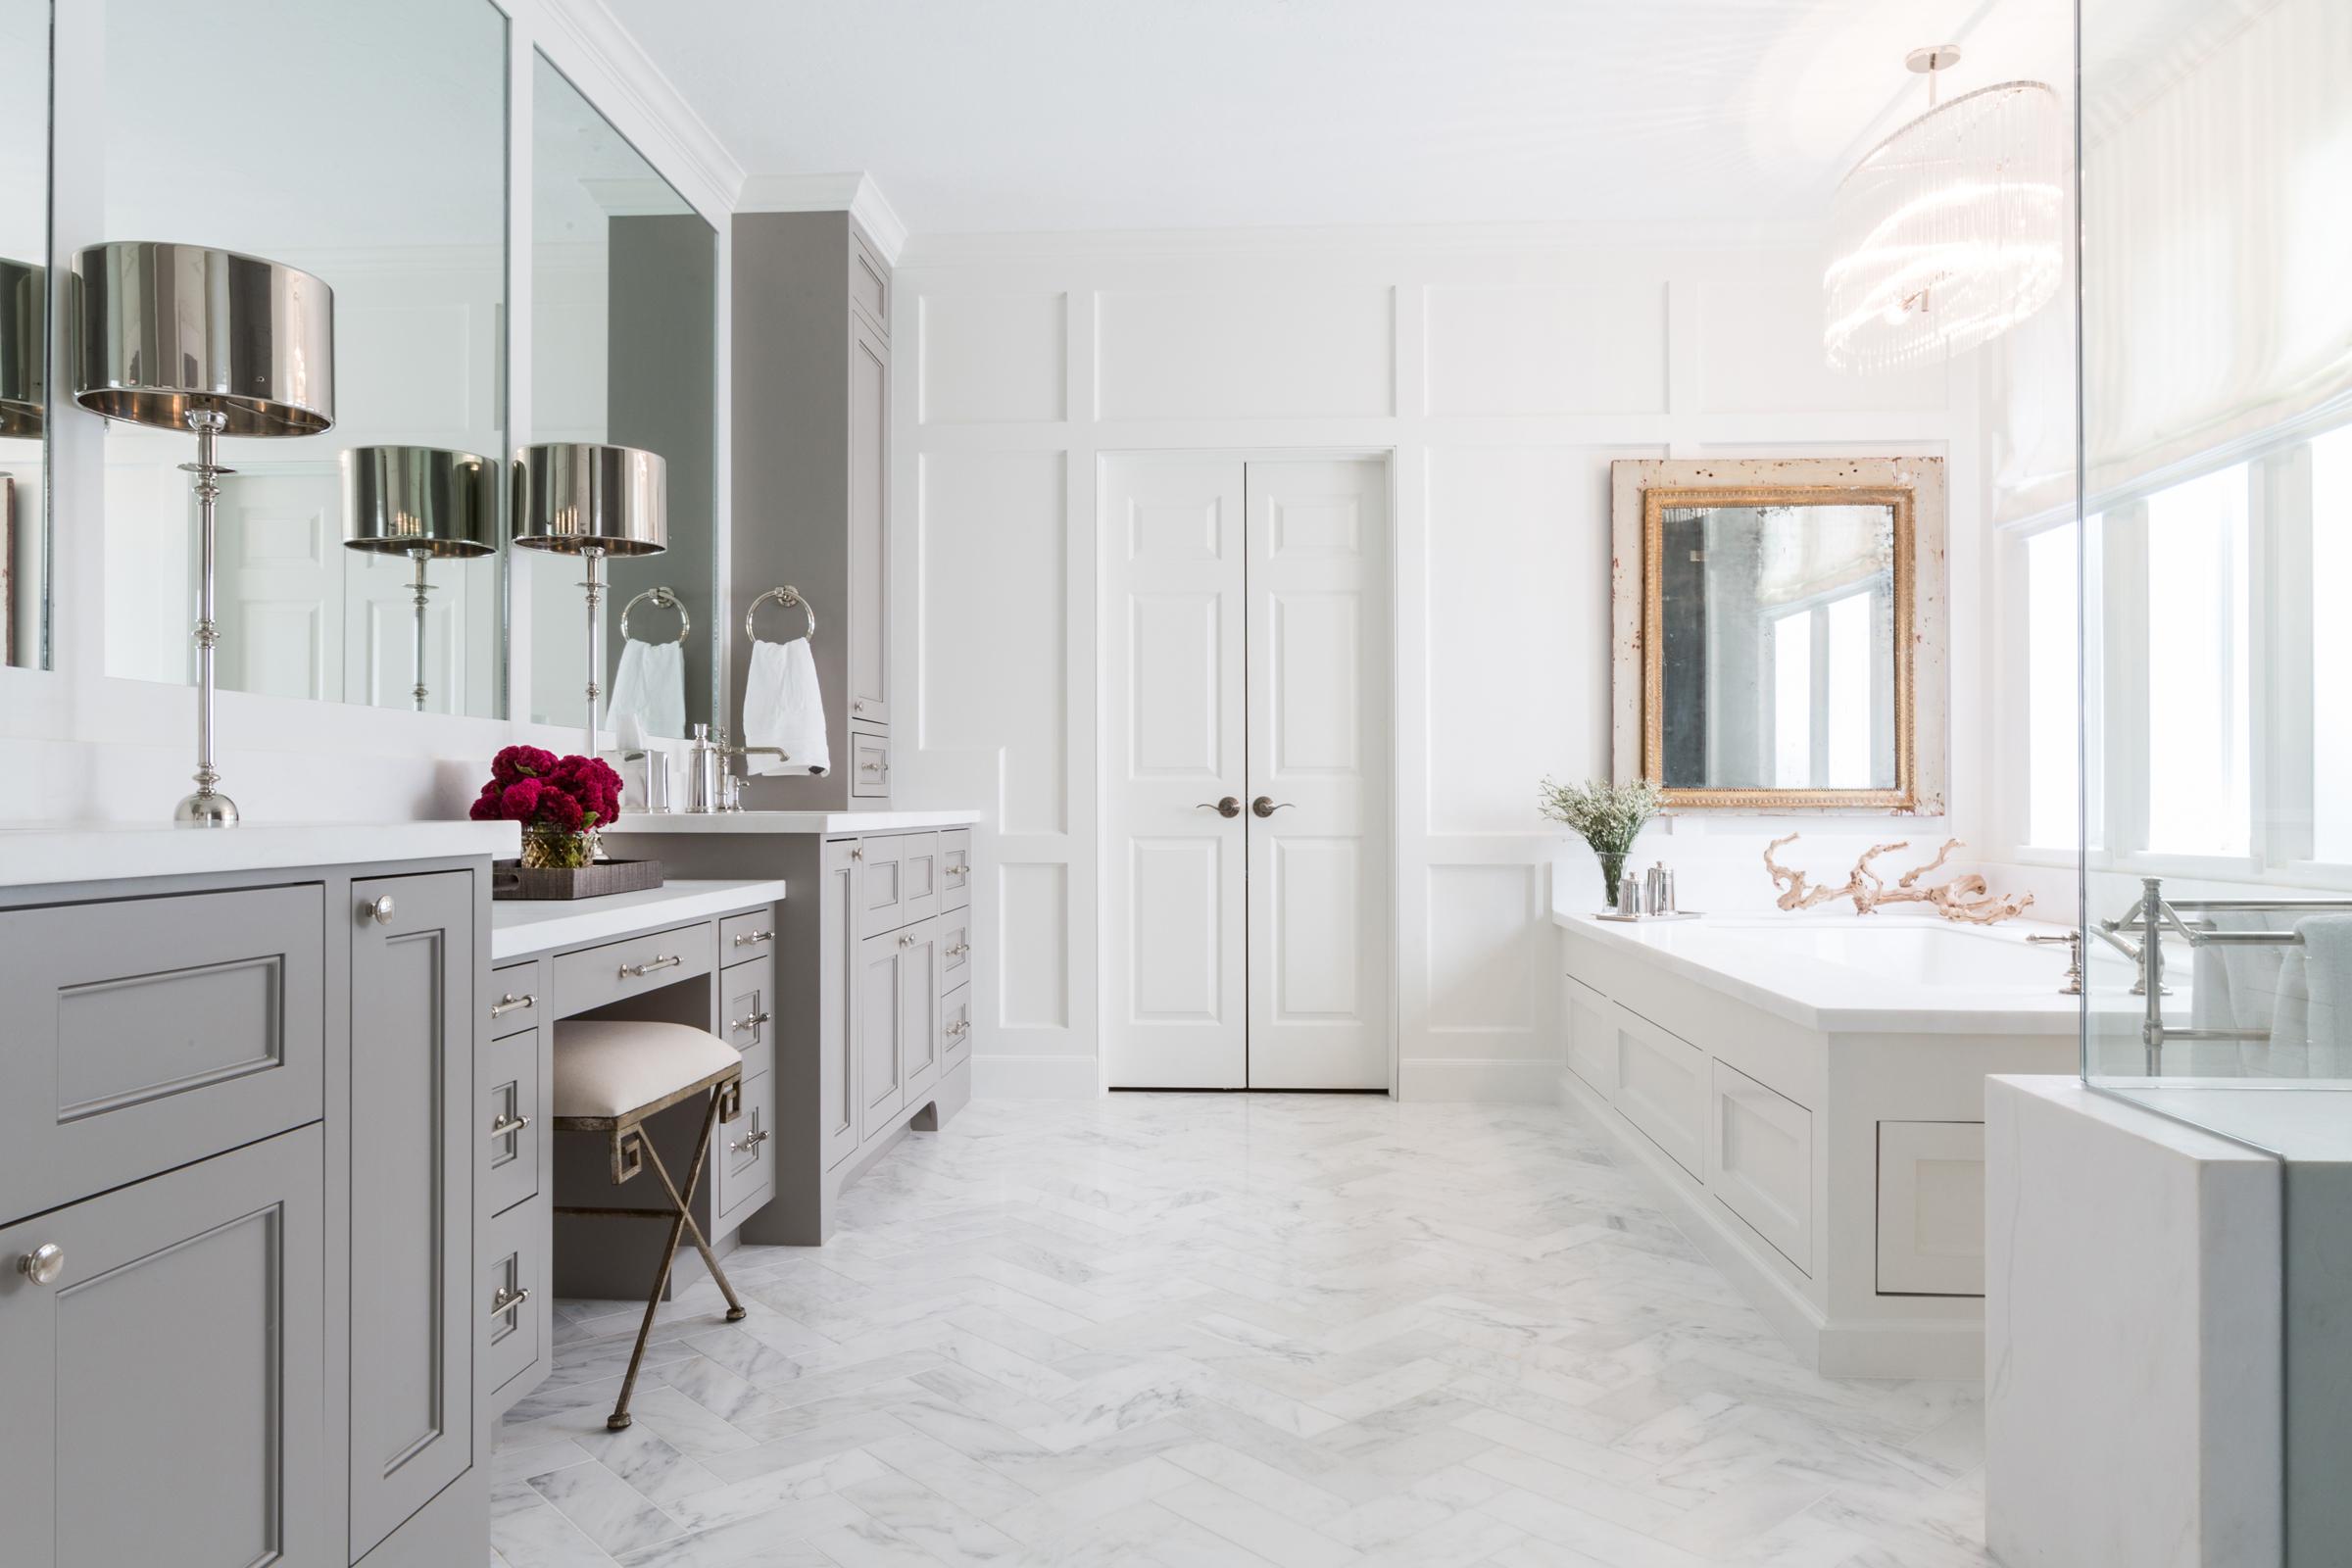 Marie-Flanigan-Interiors-Modern-Contemporary-Bath-Paneled-Walls.jpg